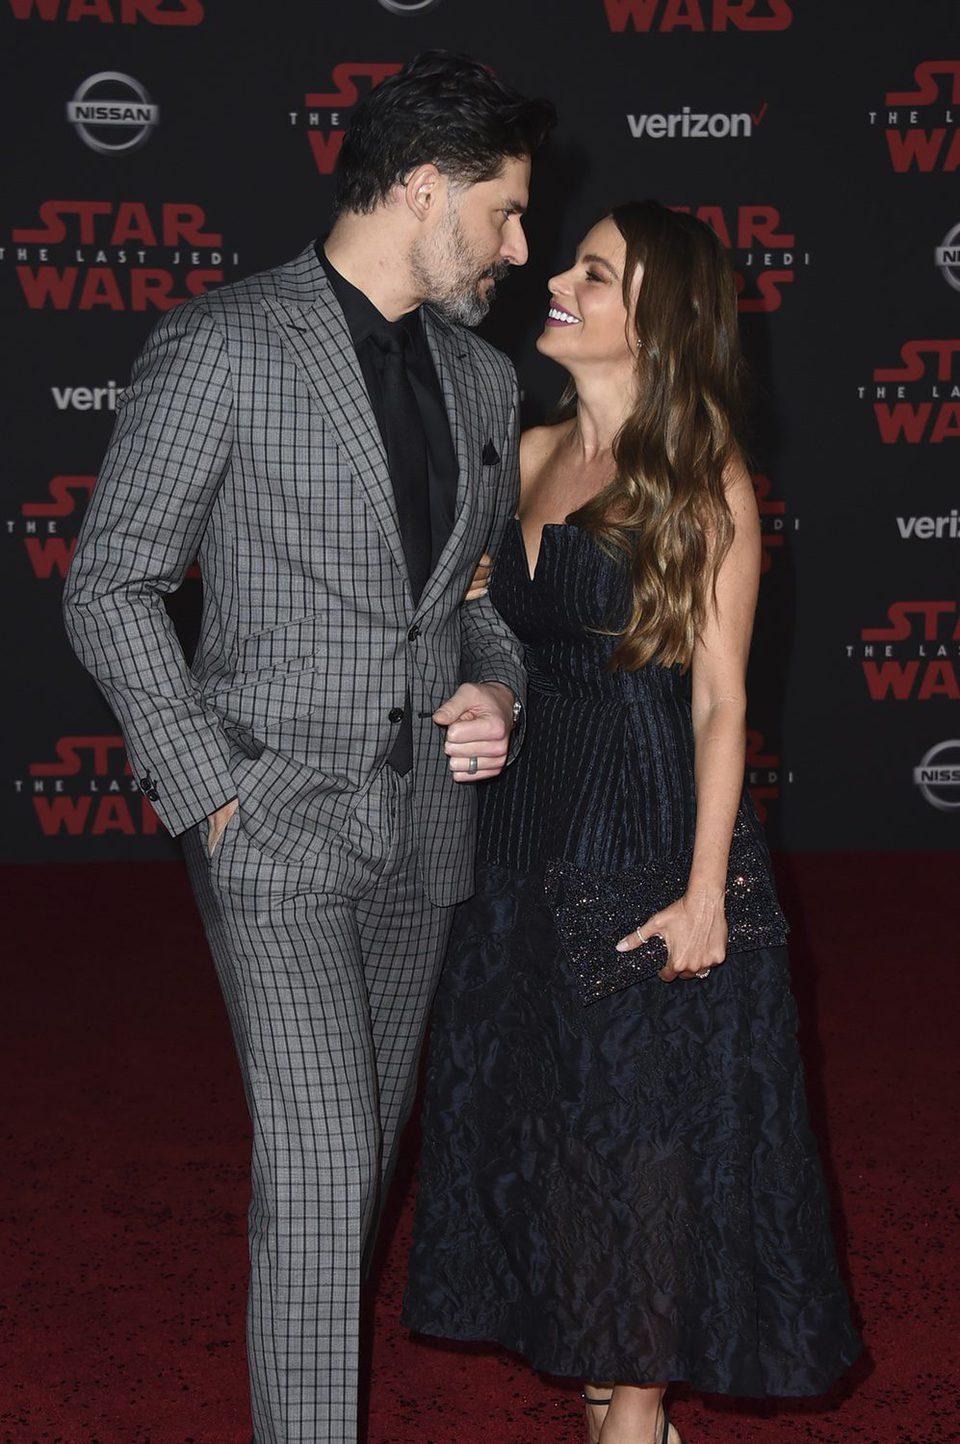 Joe Manganiello and Sofia Vergara at the Star Wars: The Last Jedi premiere